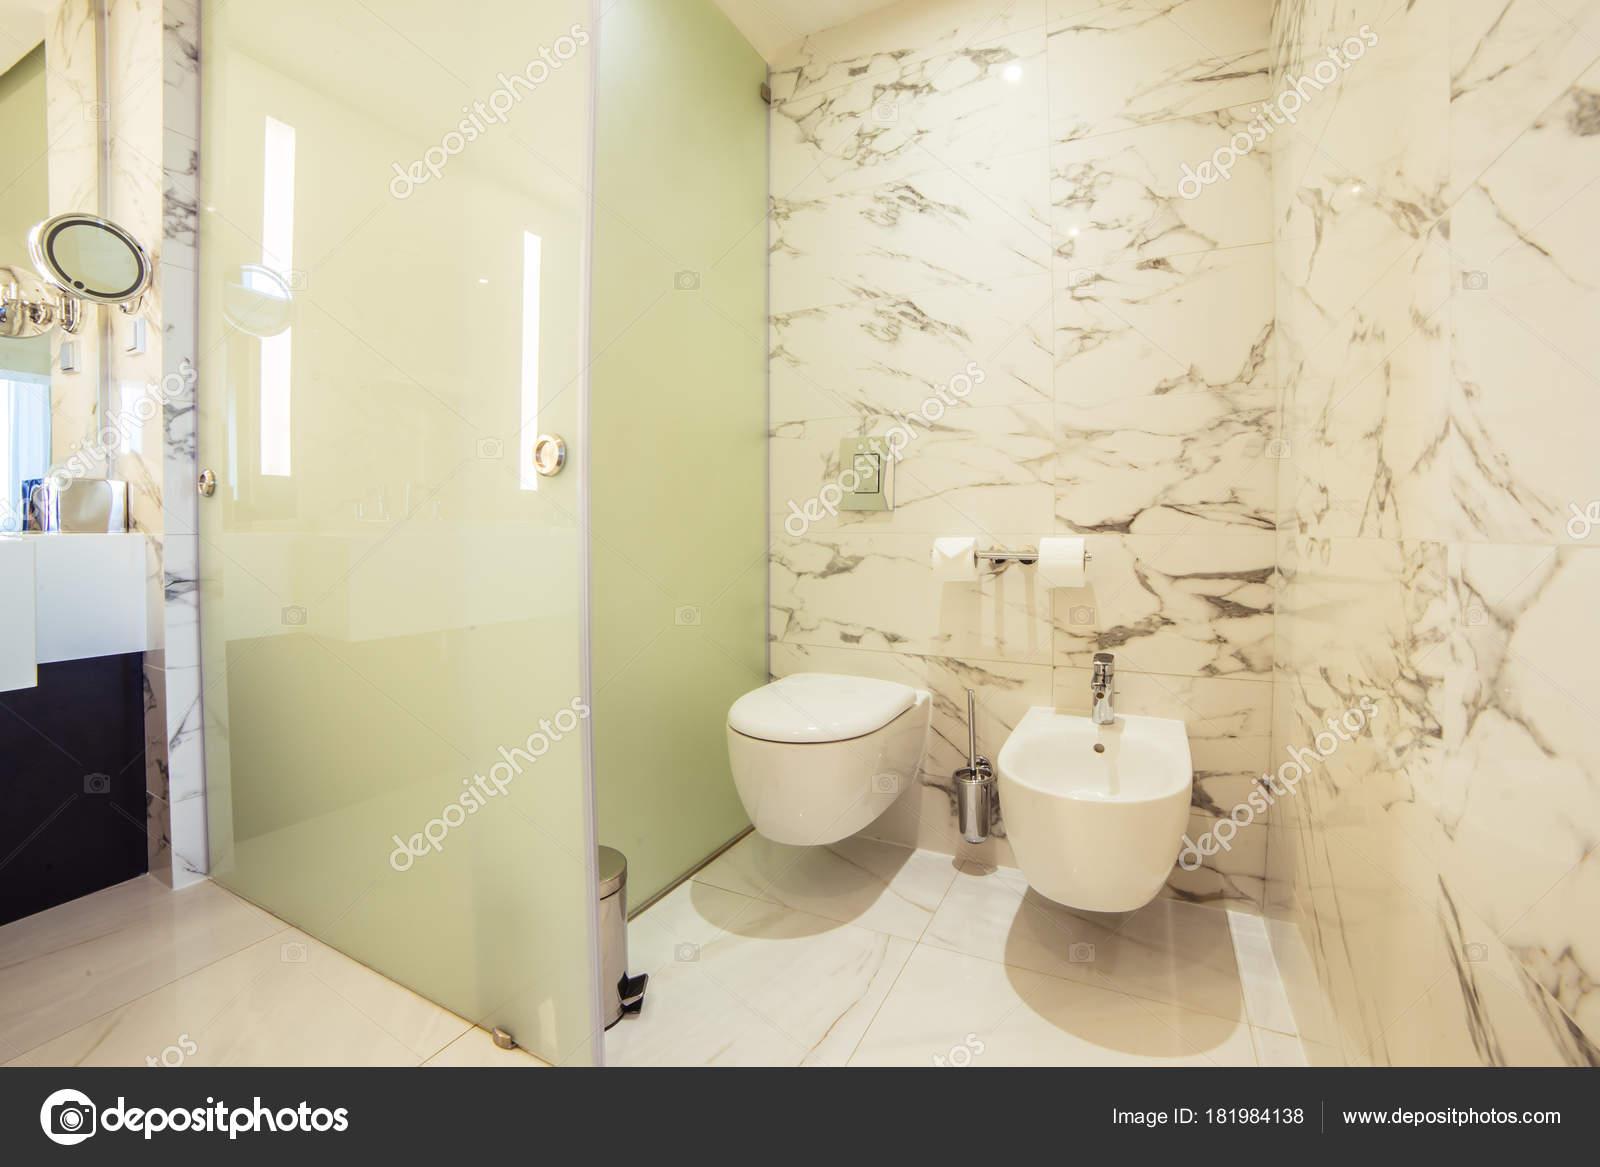 designer bathroom with shower tiling — Stock Photo © ufabizphoto ...